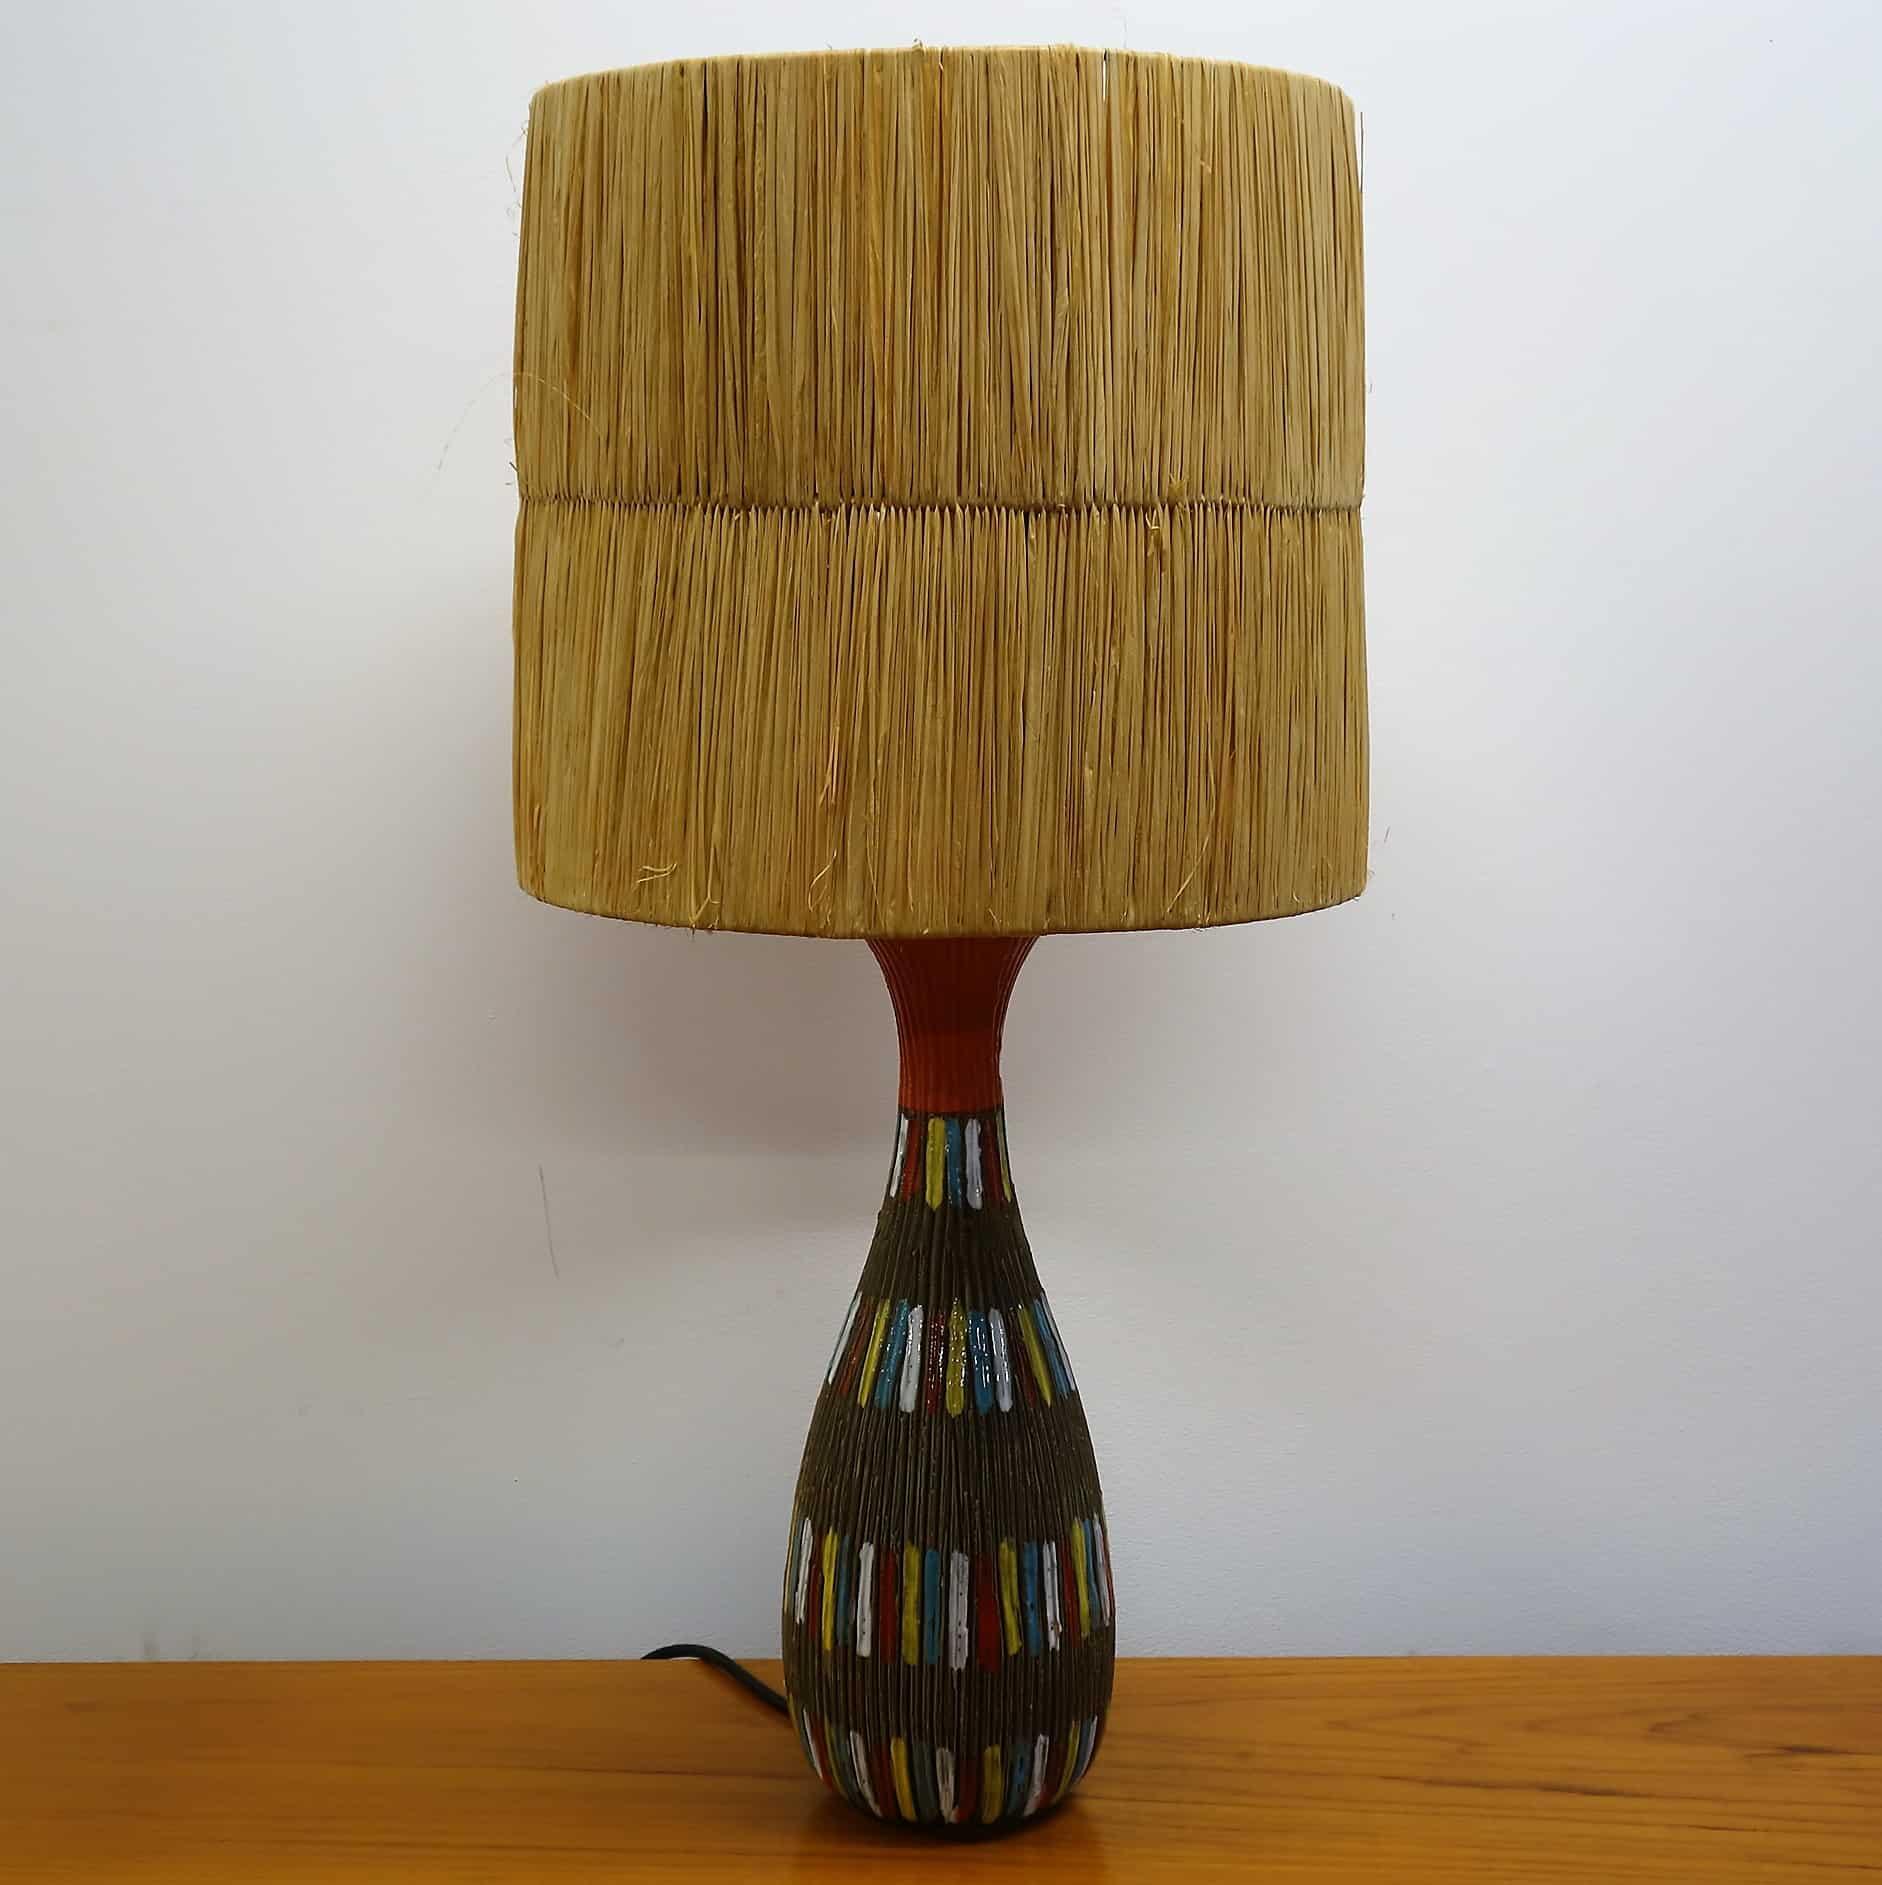 1950s Italian pottery table lamp